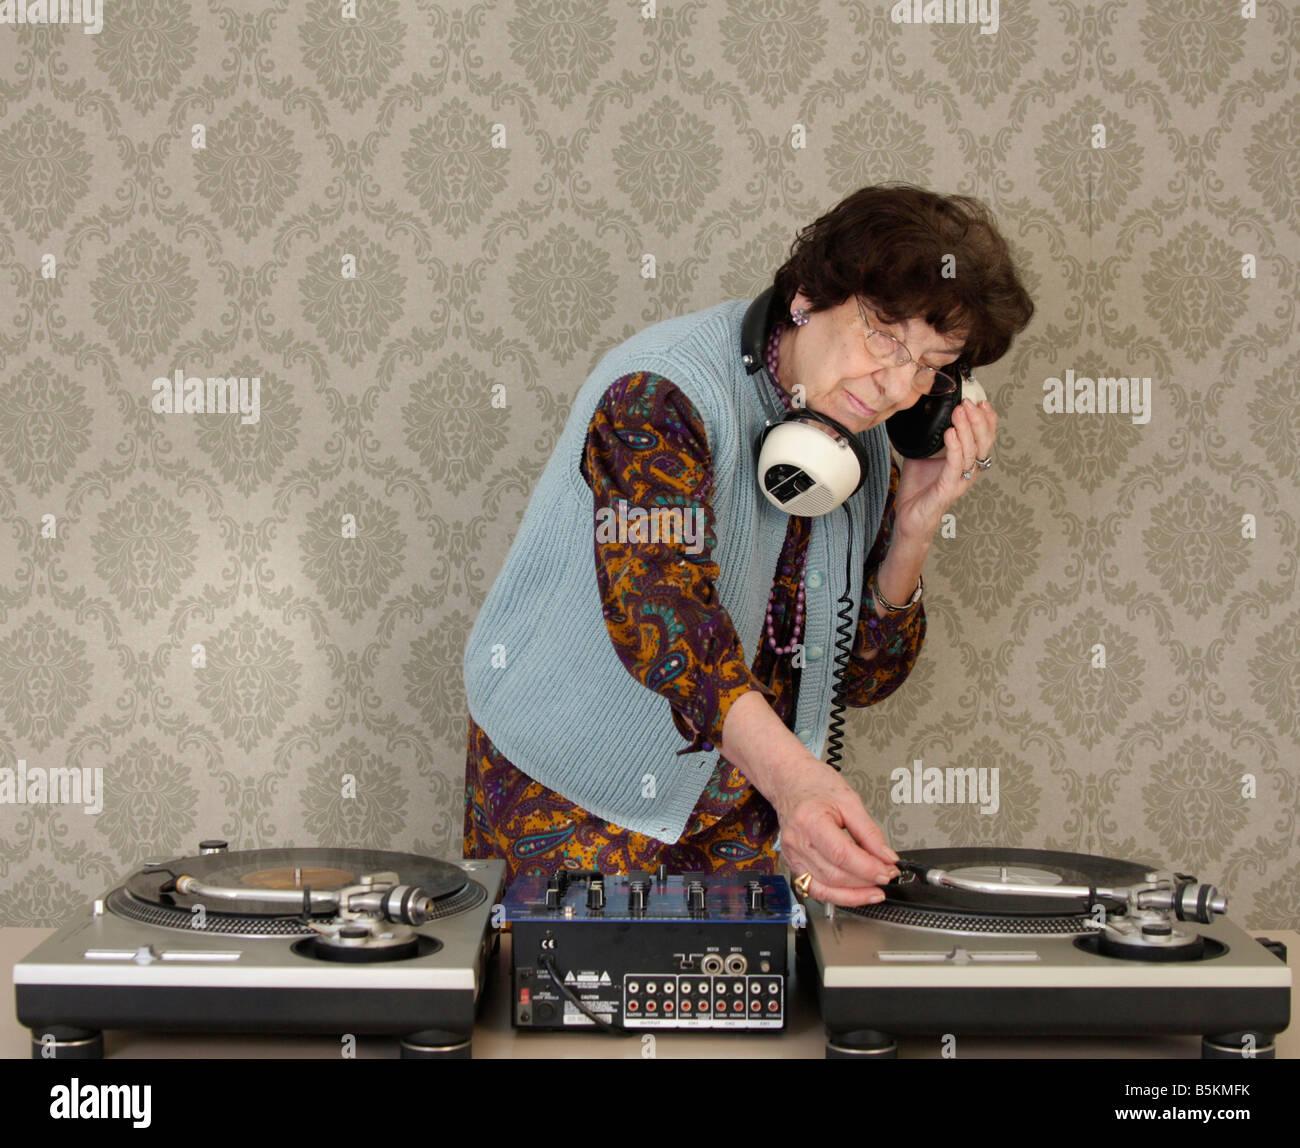 a very funky elderly granny dj go lady Stock Photo: 20716855